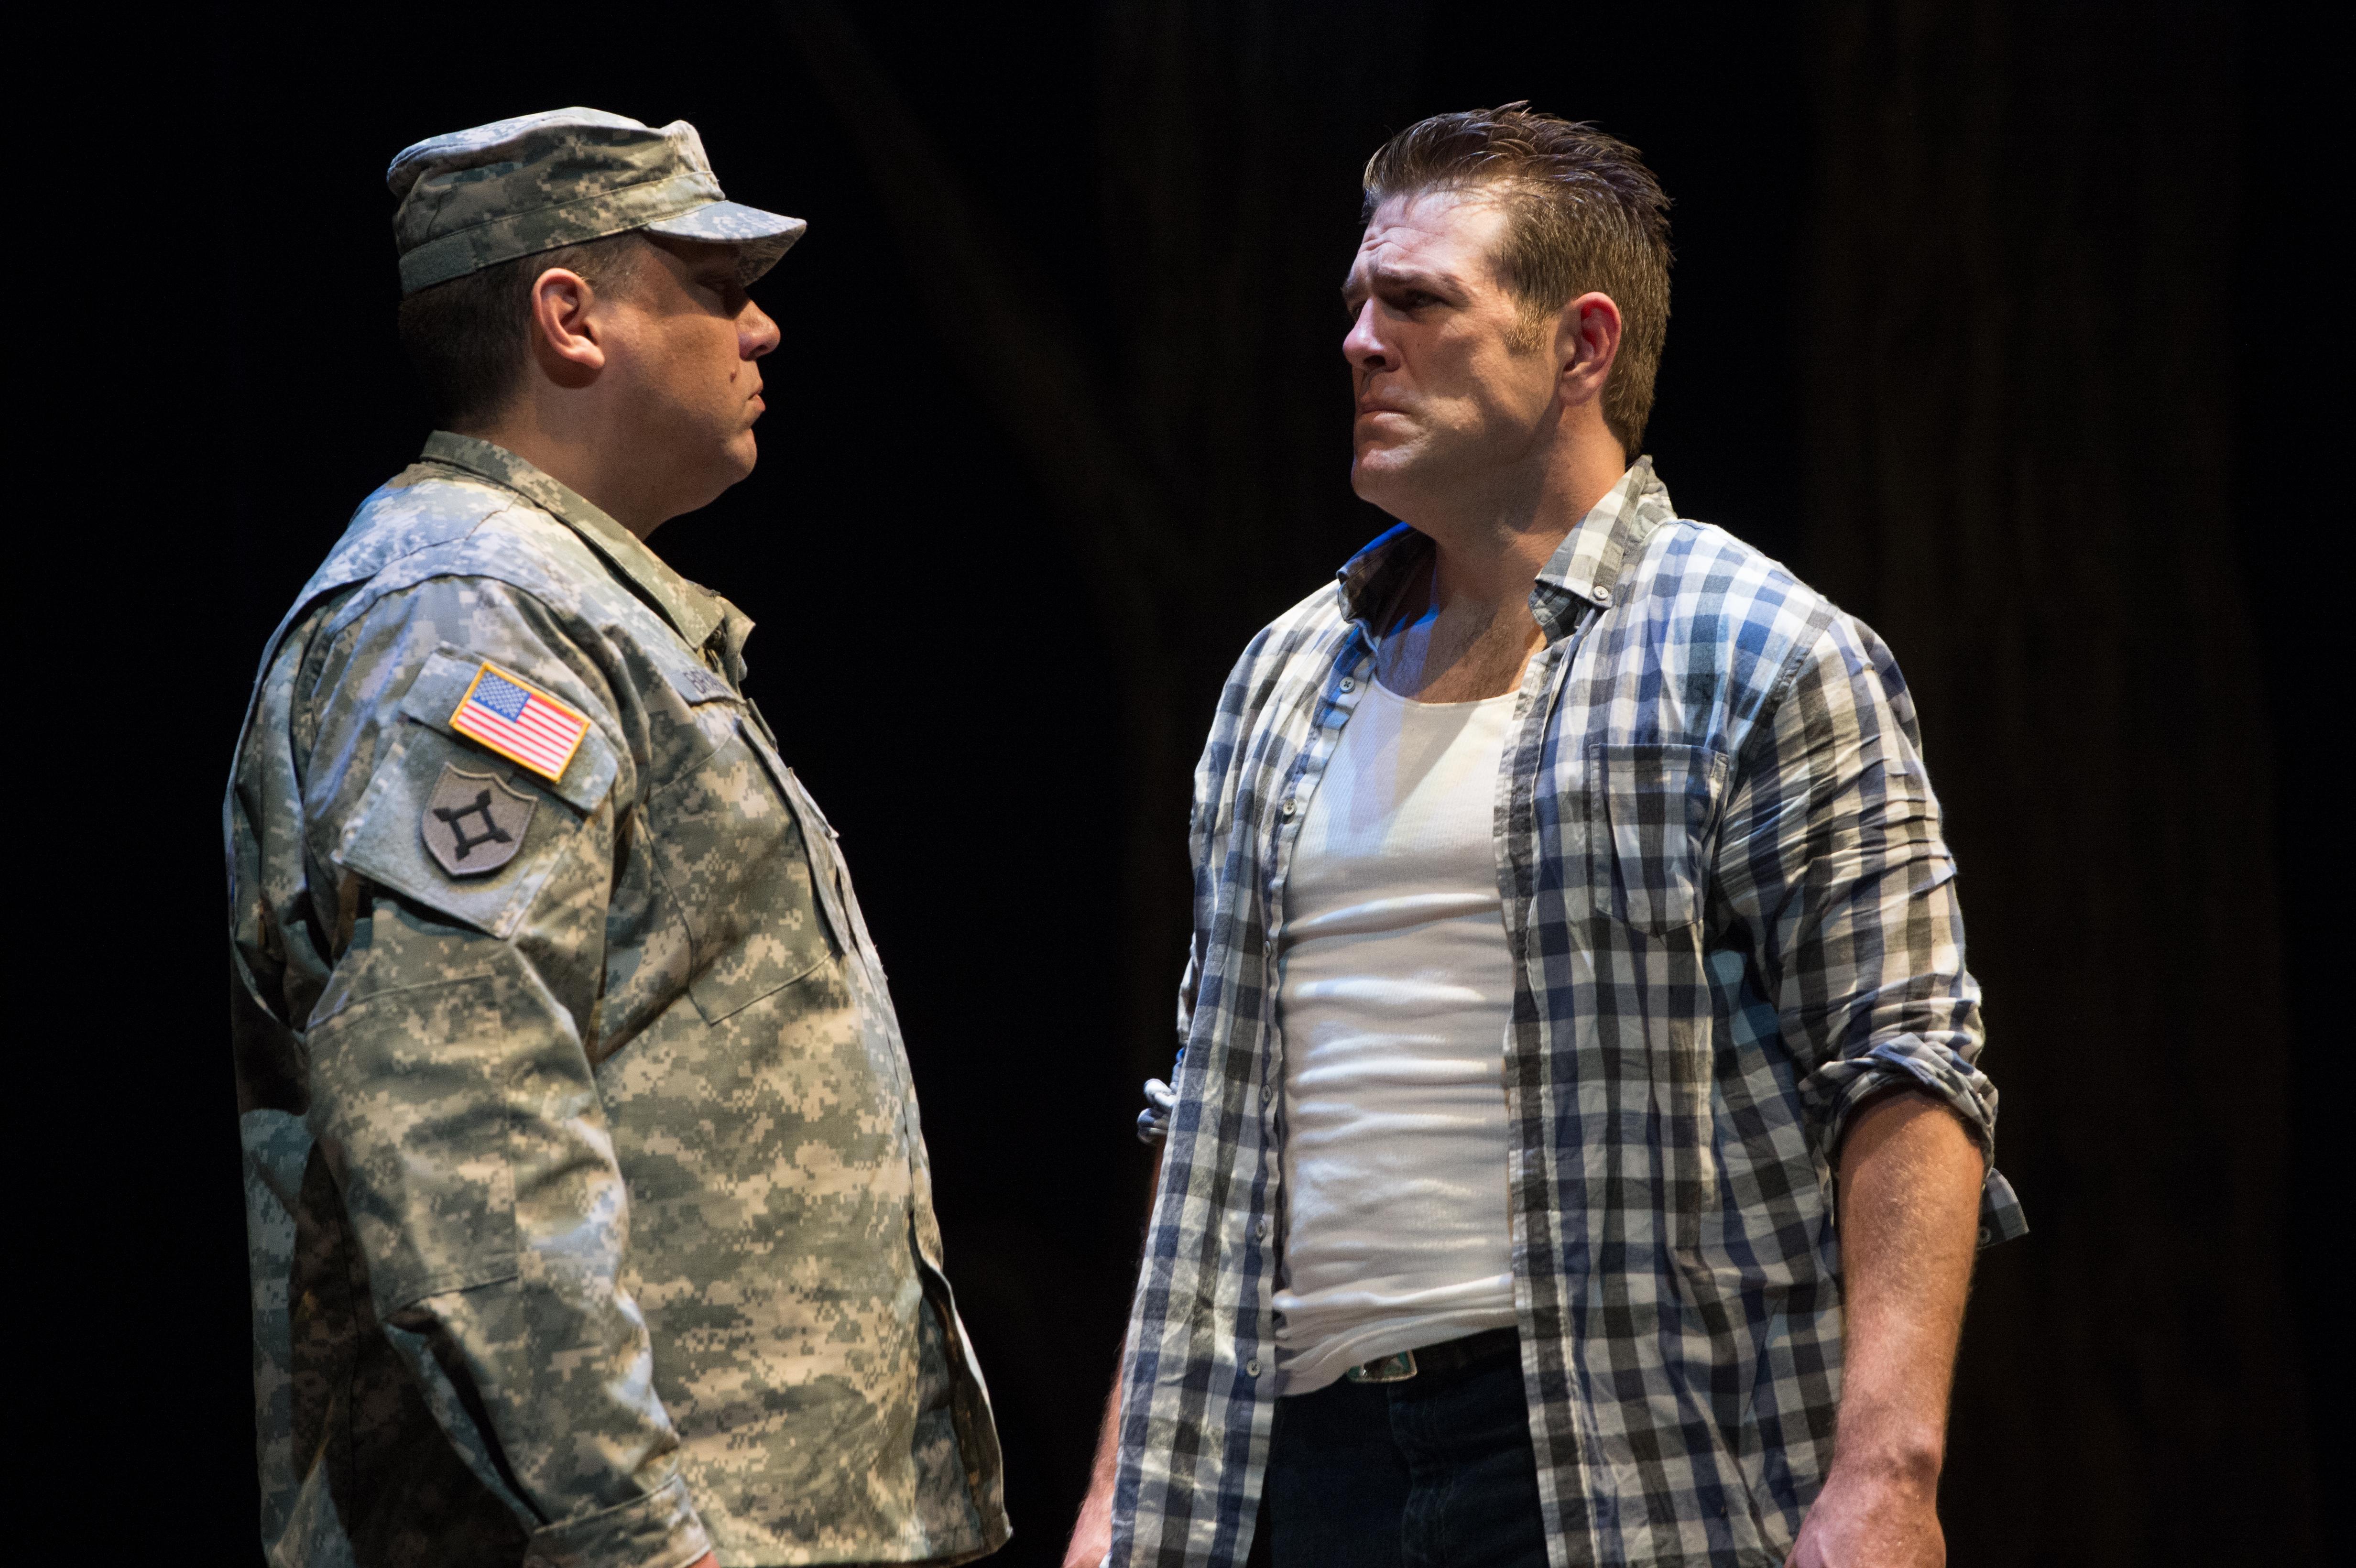 Adam with Sgt. Bryan